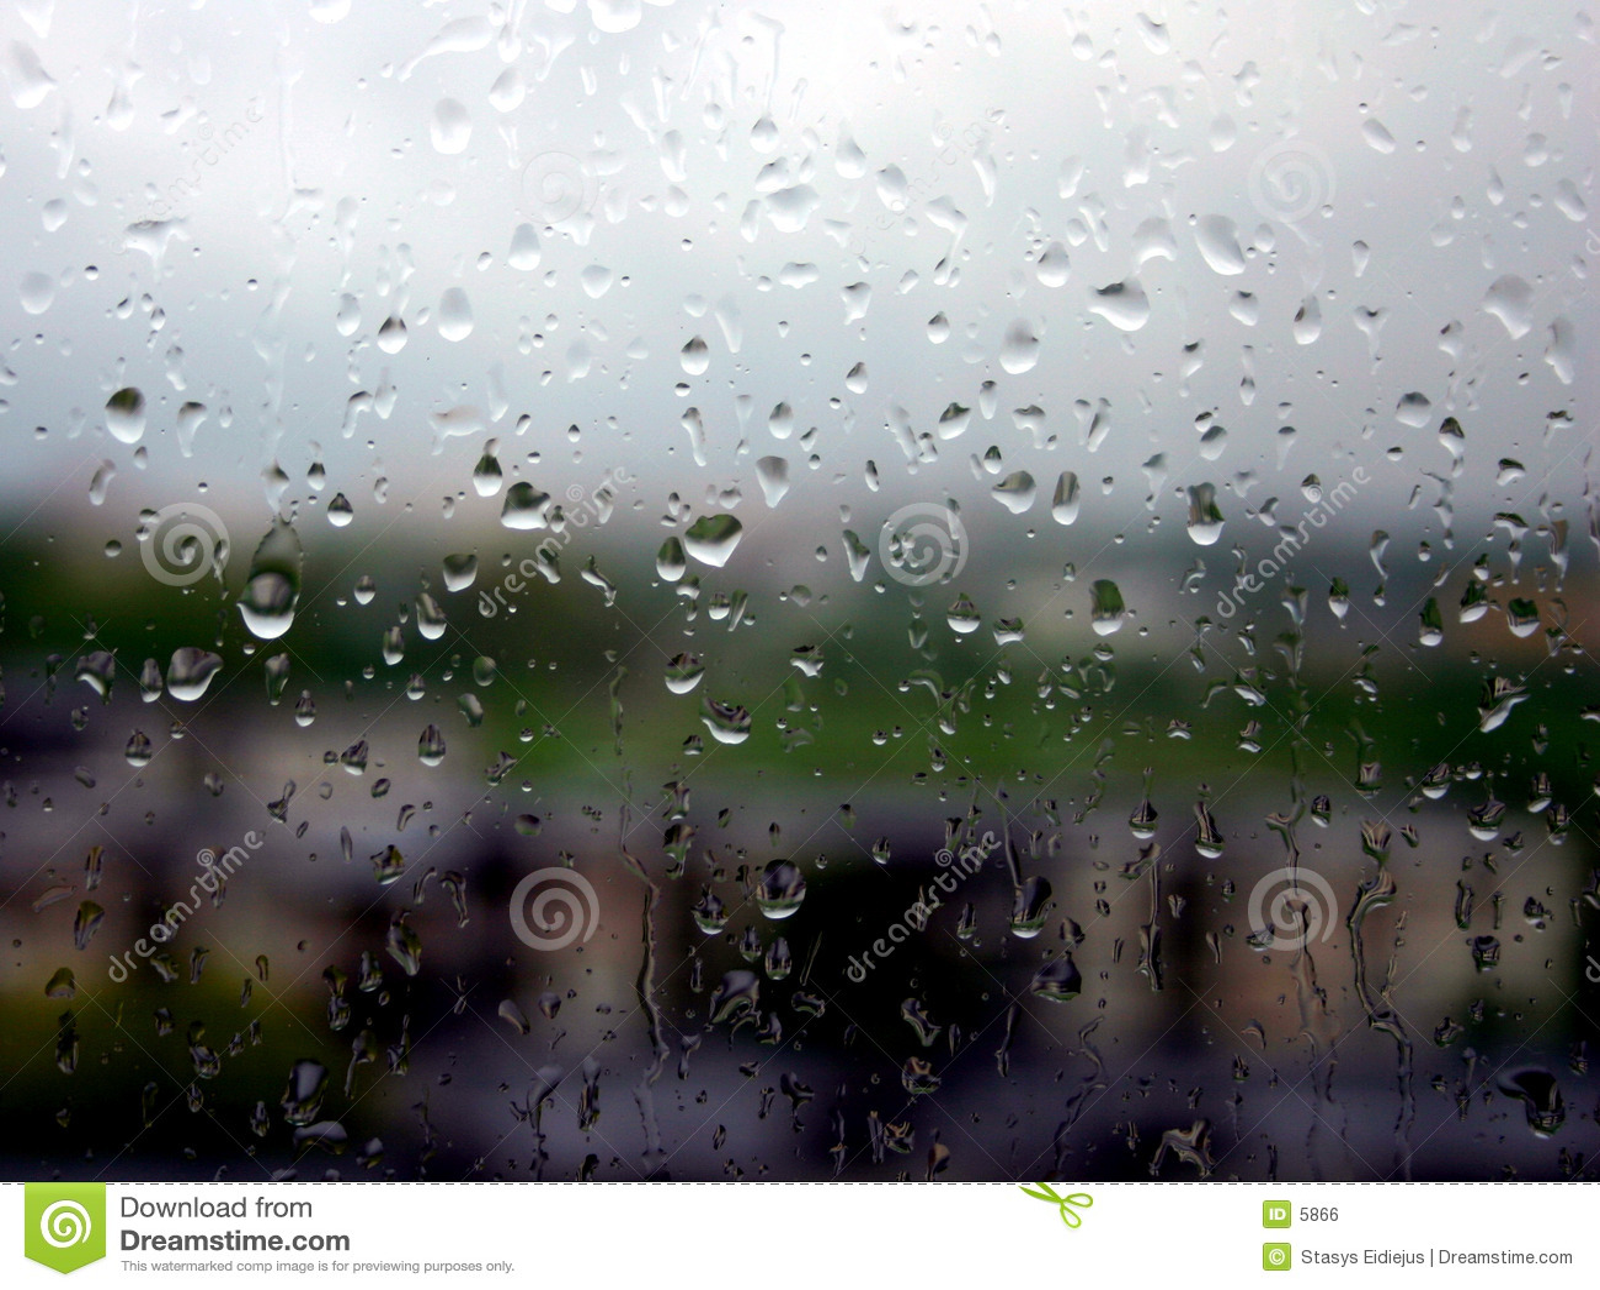 It s a raining day